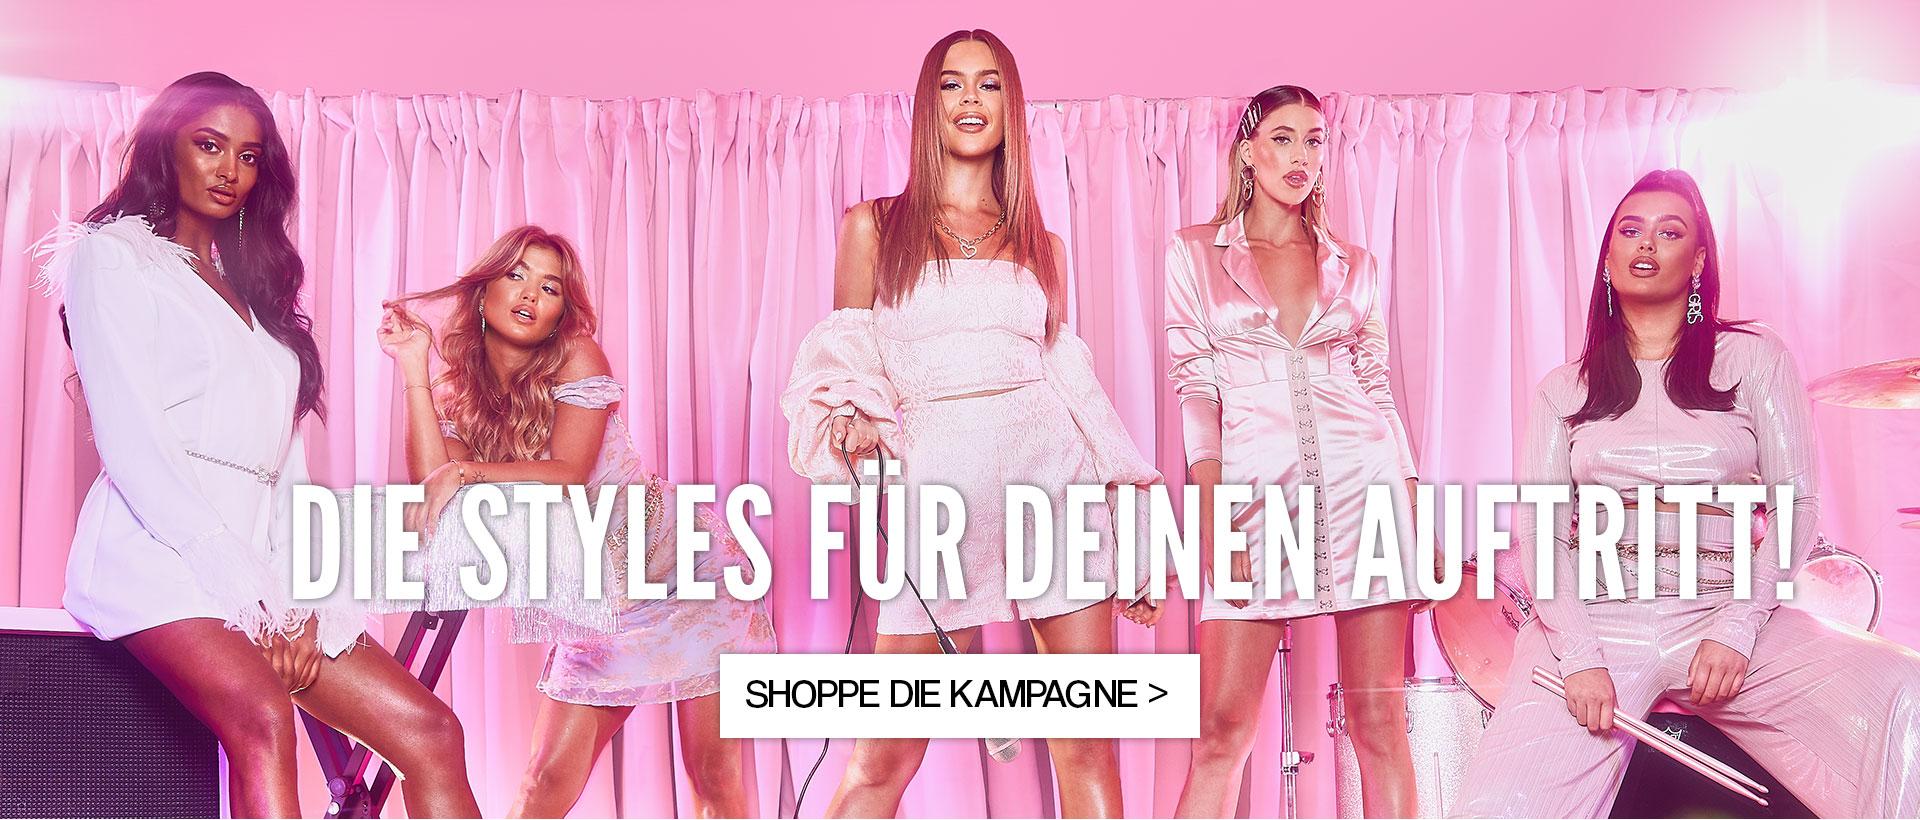 buy popular ddd20 d58fc Kleidung | Damen & Herren Kleidung & Mode | Online Shoppen ...